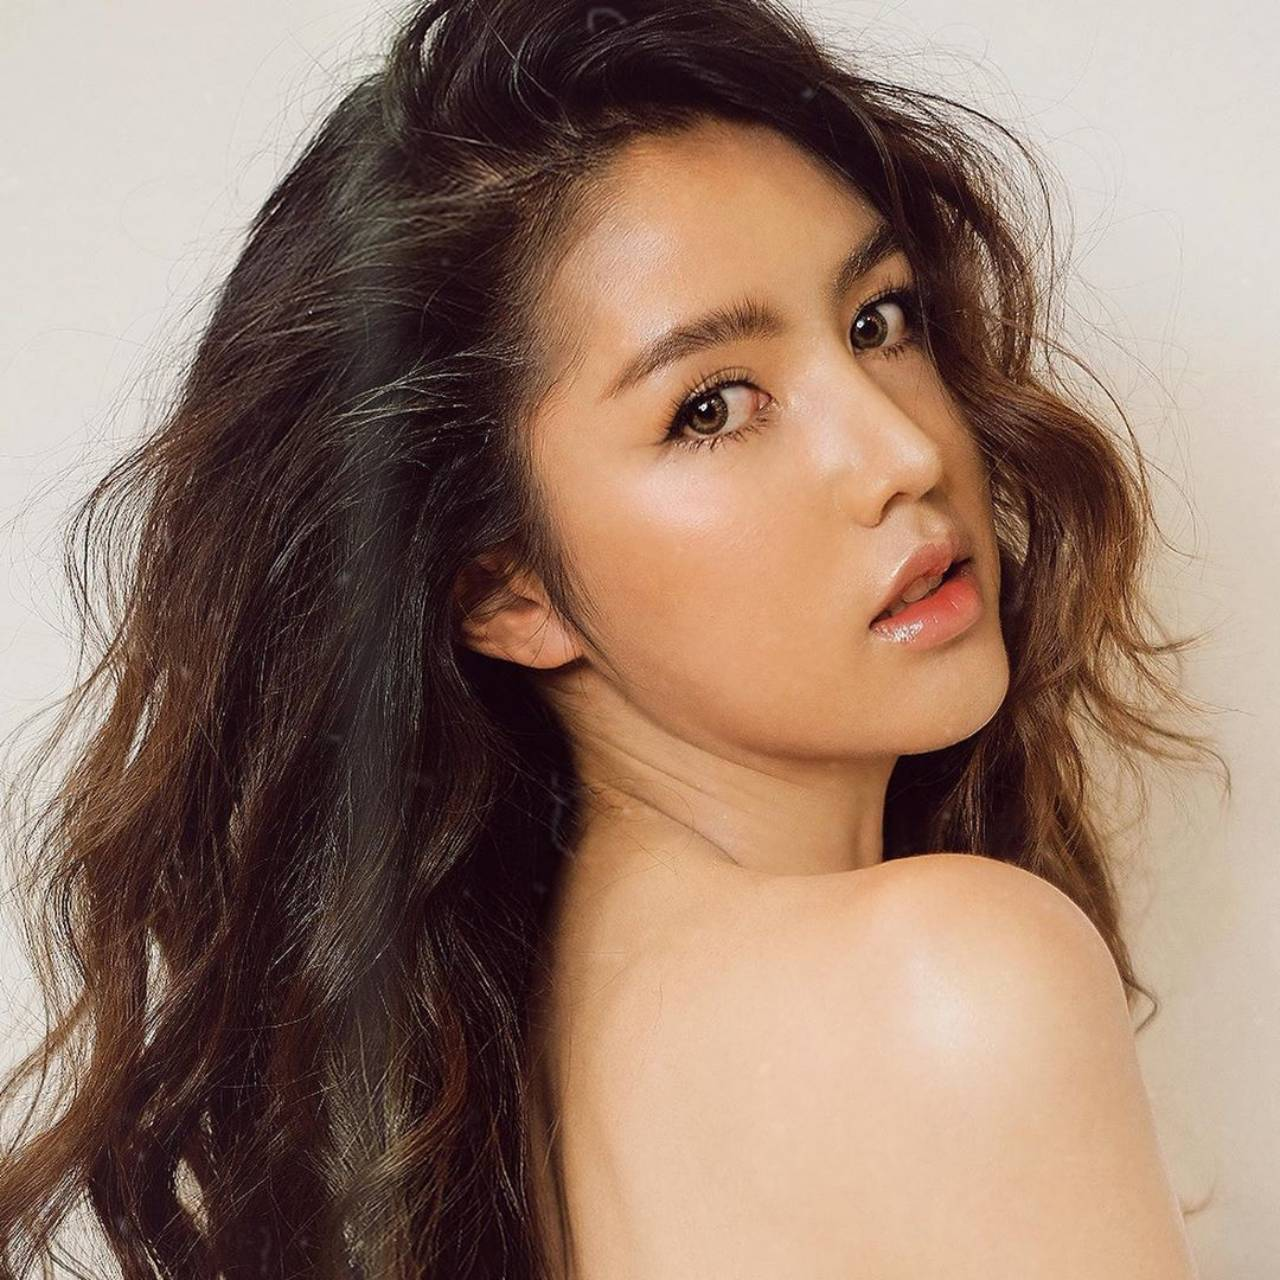 Min Kamonluck - Most Beautiful Thailand Transgender Model